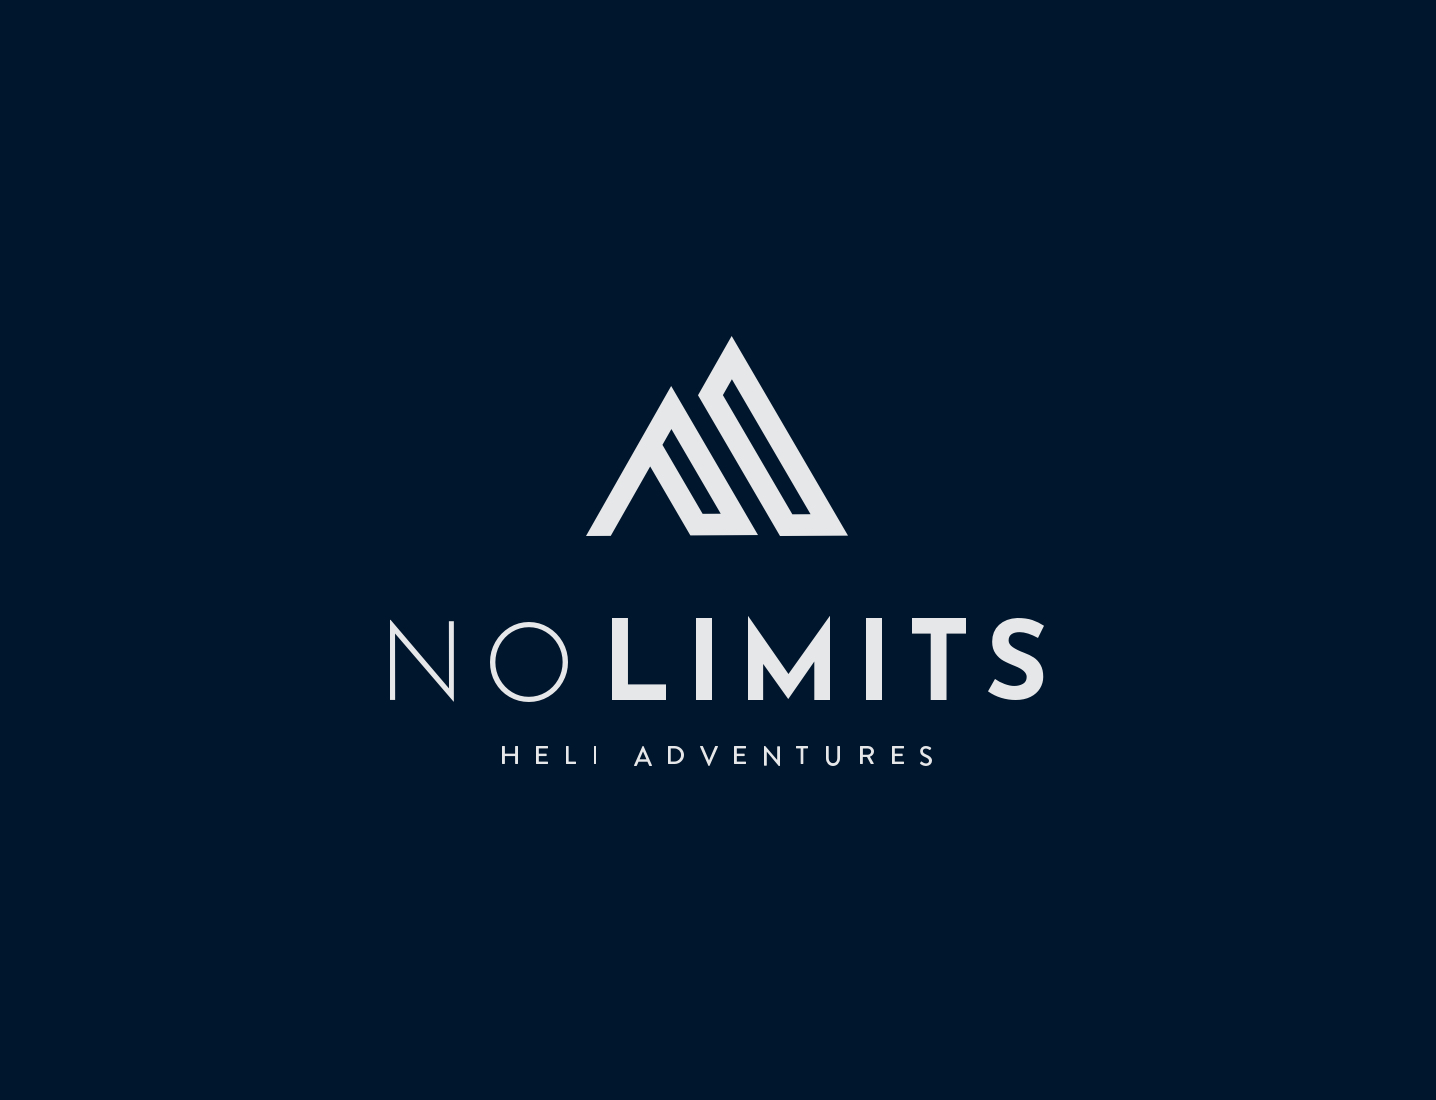 No Limits Heli Adventures Logo